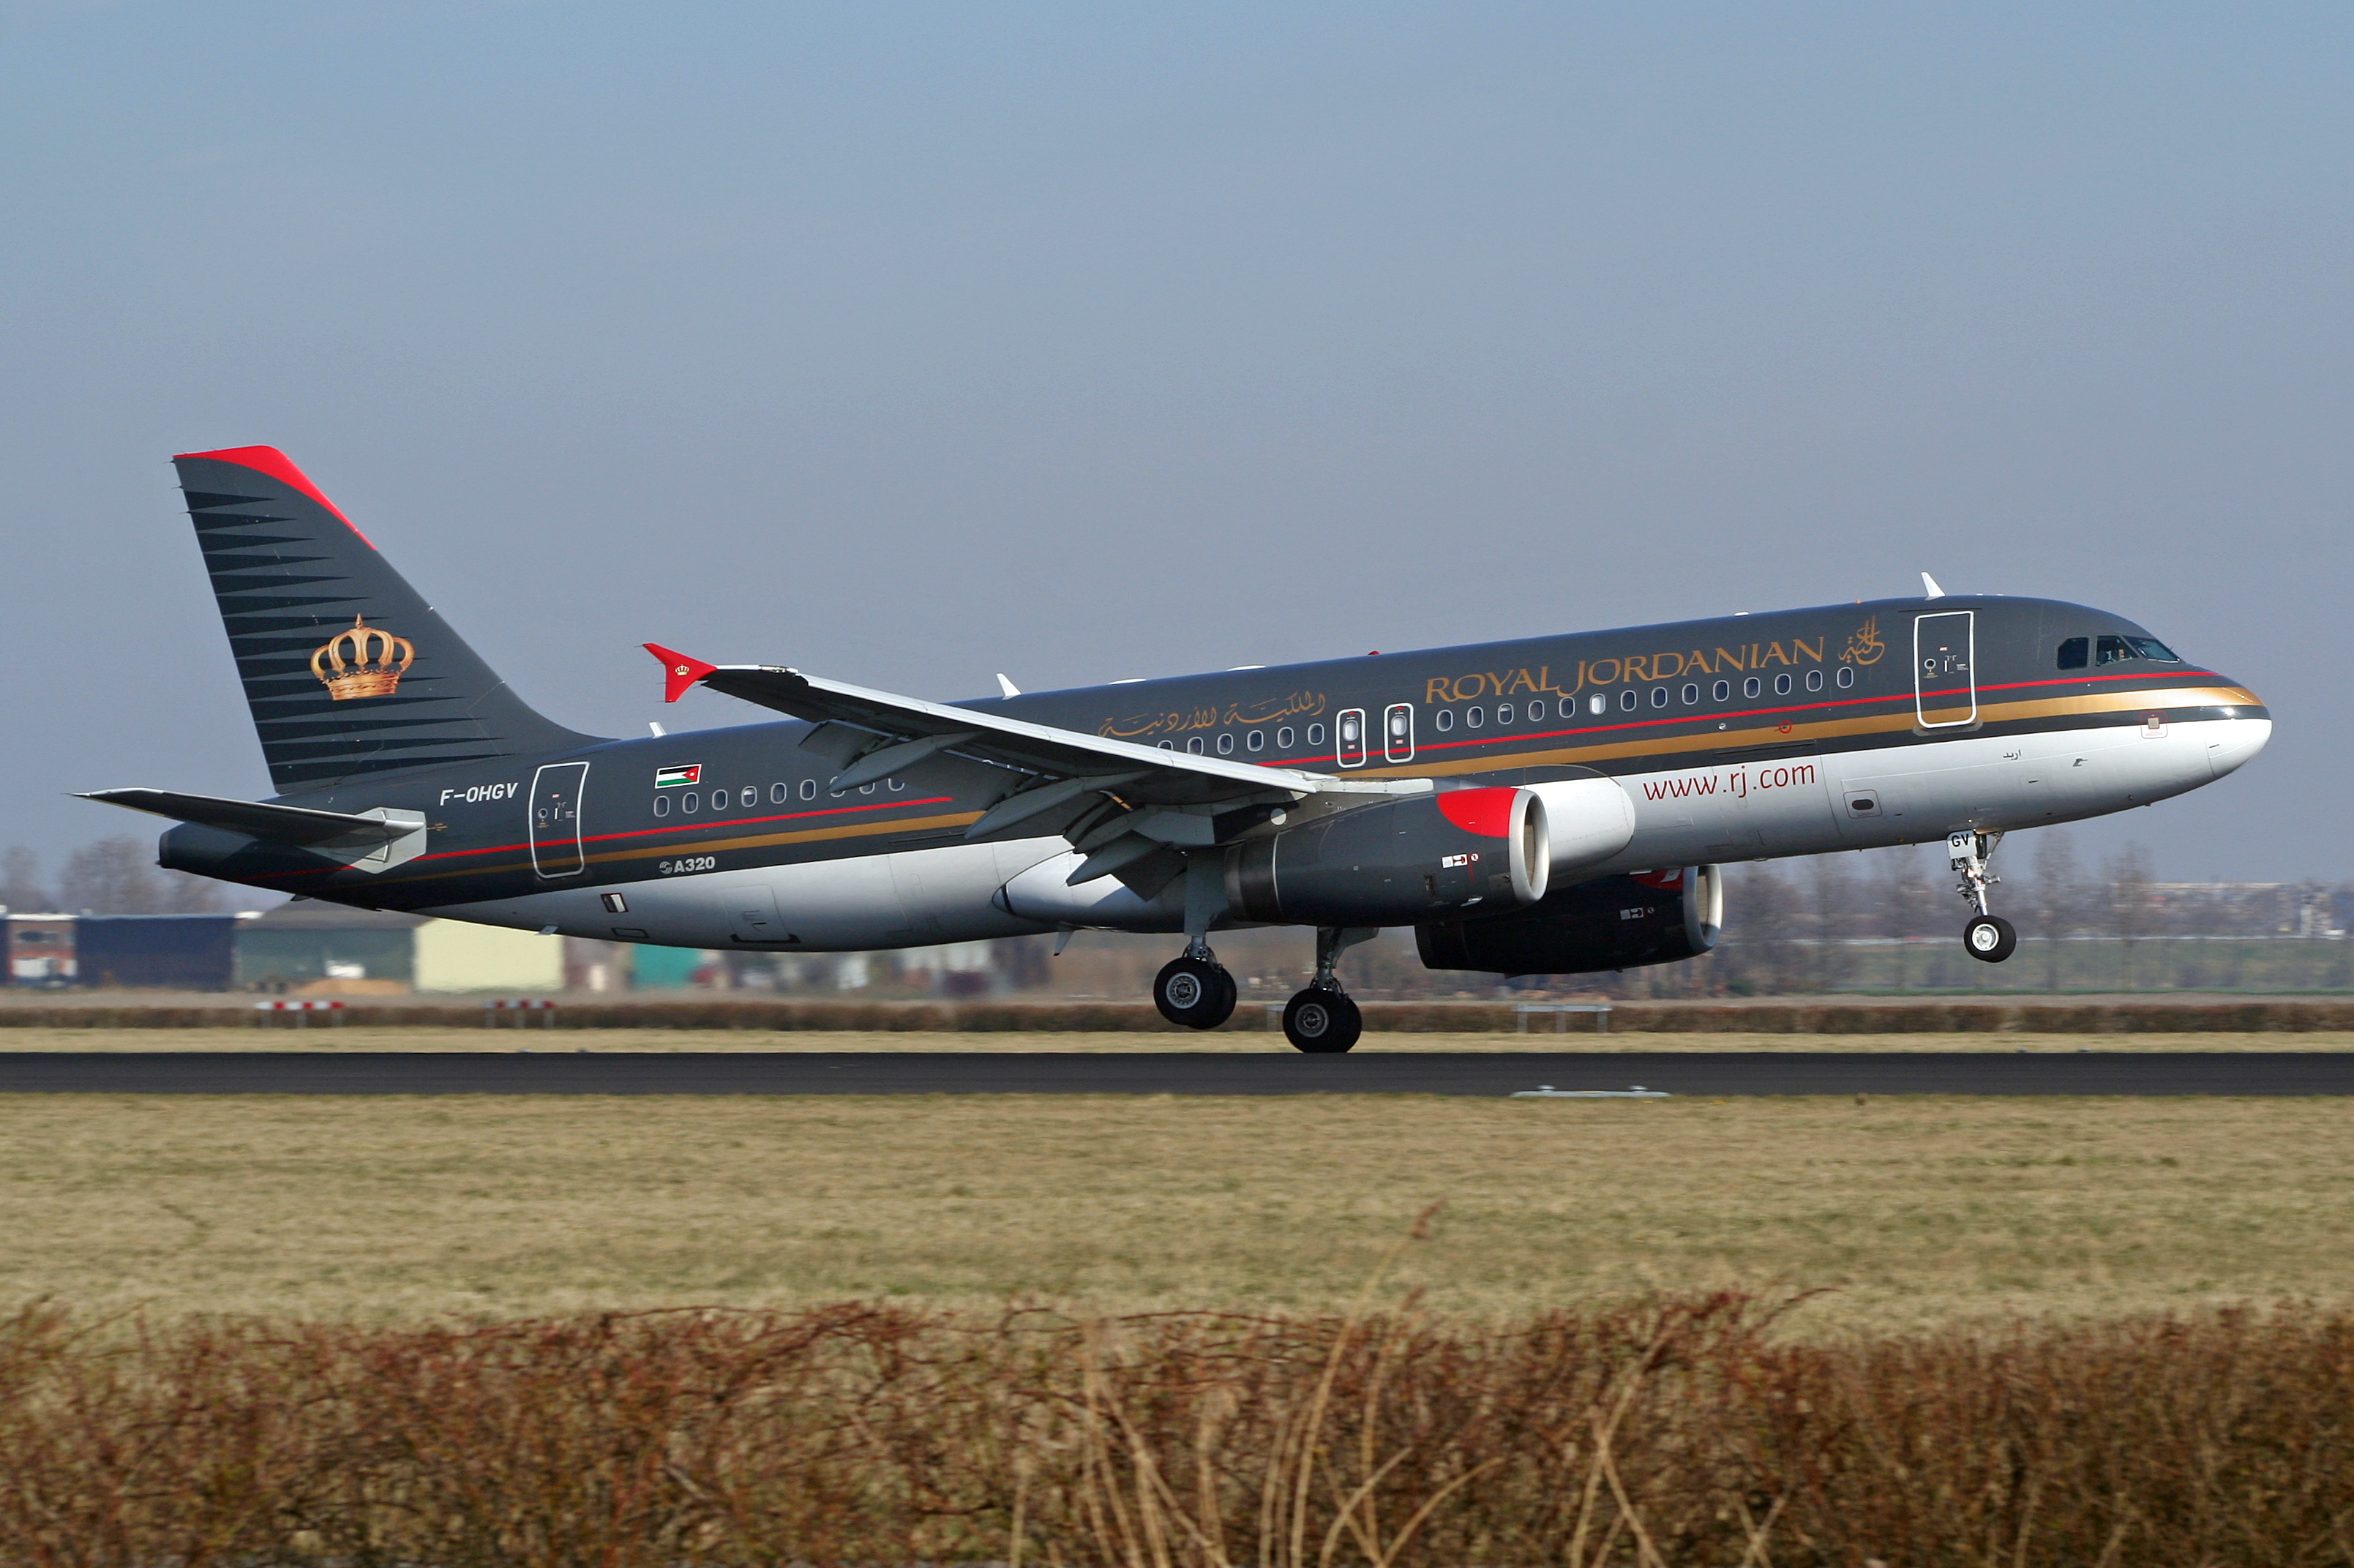 En Airbus A320 fra Royal Jordanian Airlines. Foto: Björn Strey